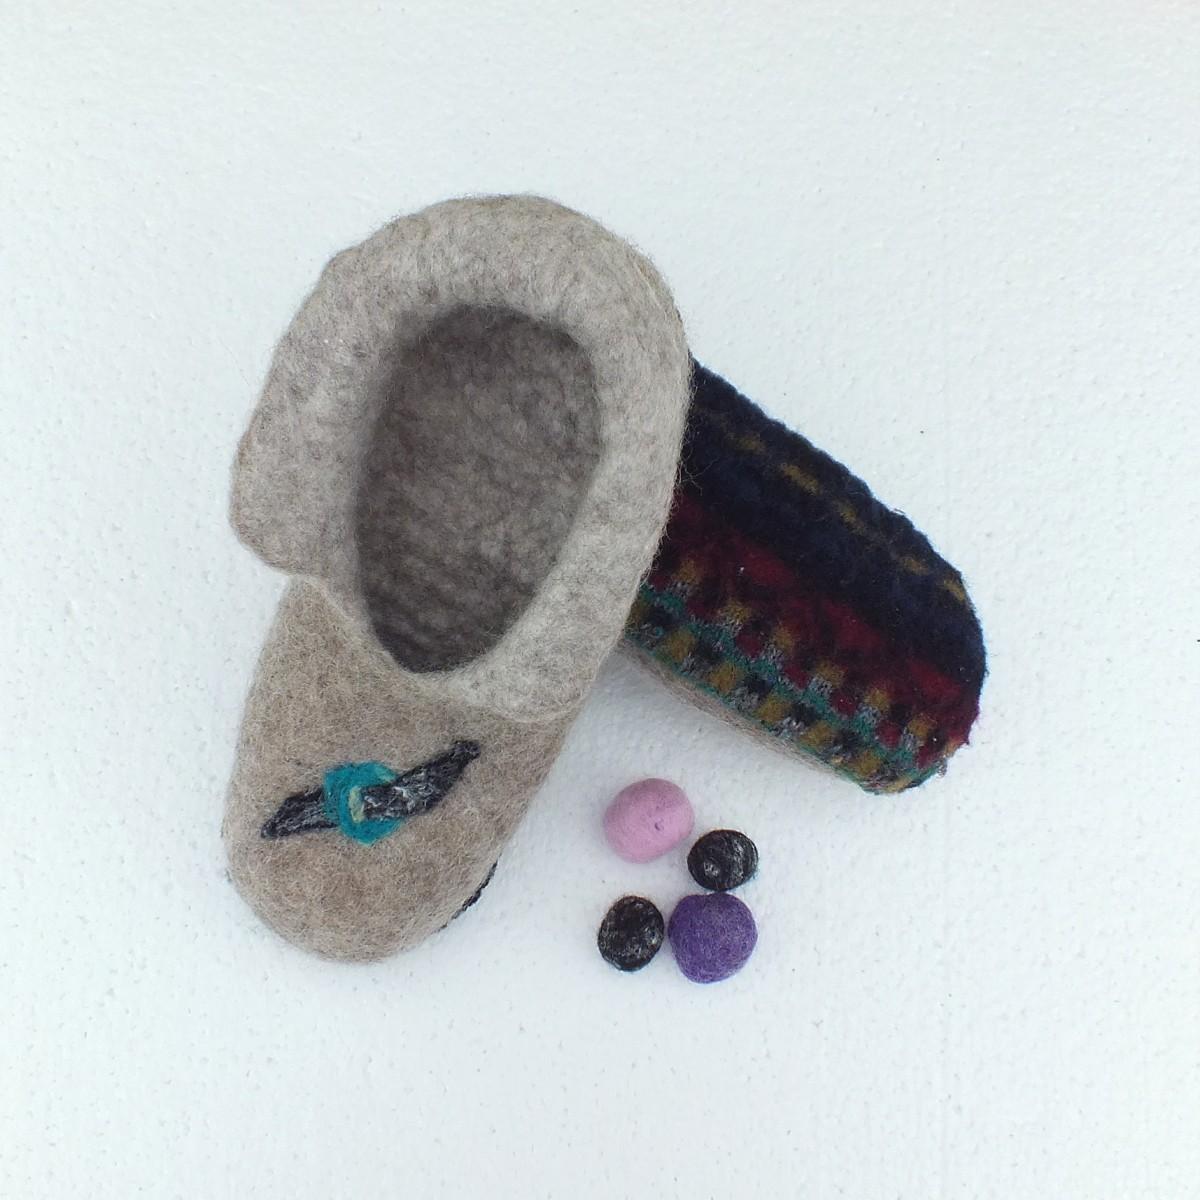 Felted Slippers Felt New Zealand Merino Wool Footware Felt